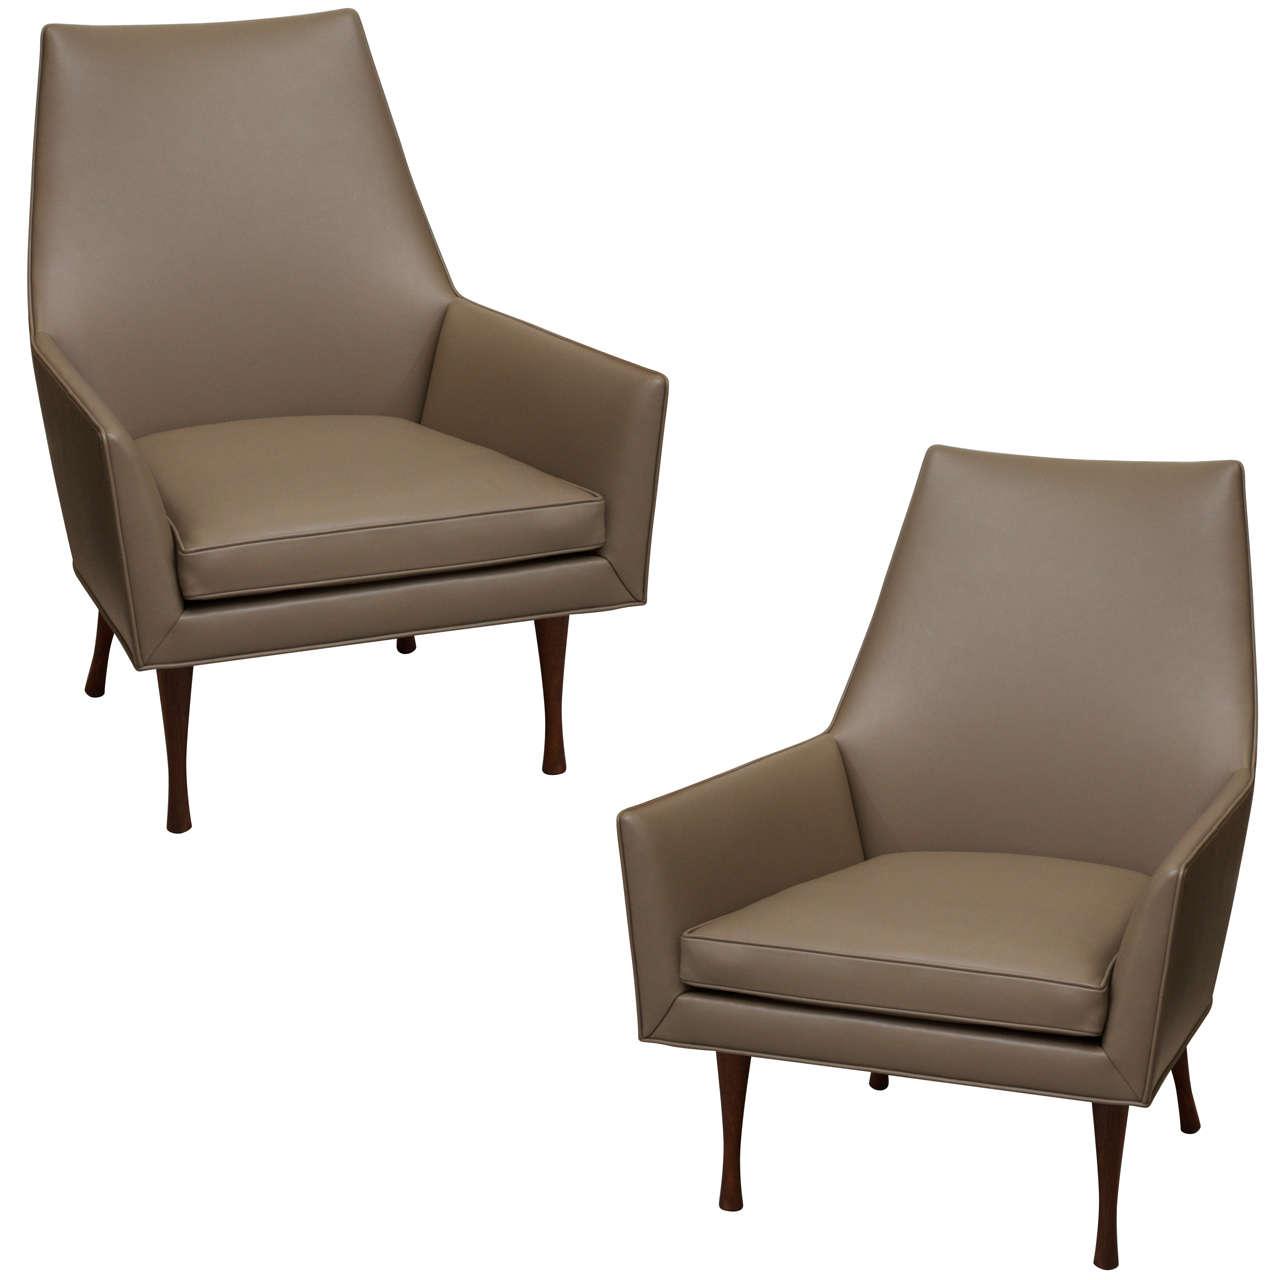 Paul McCobb Lounge Chair at 1stdibs